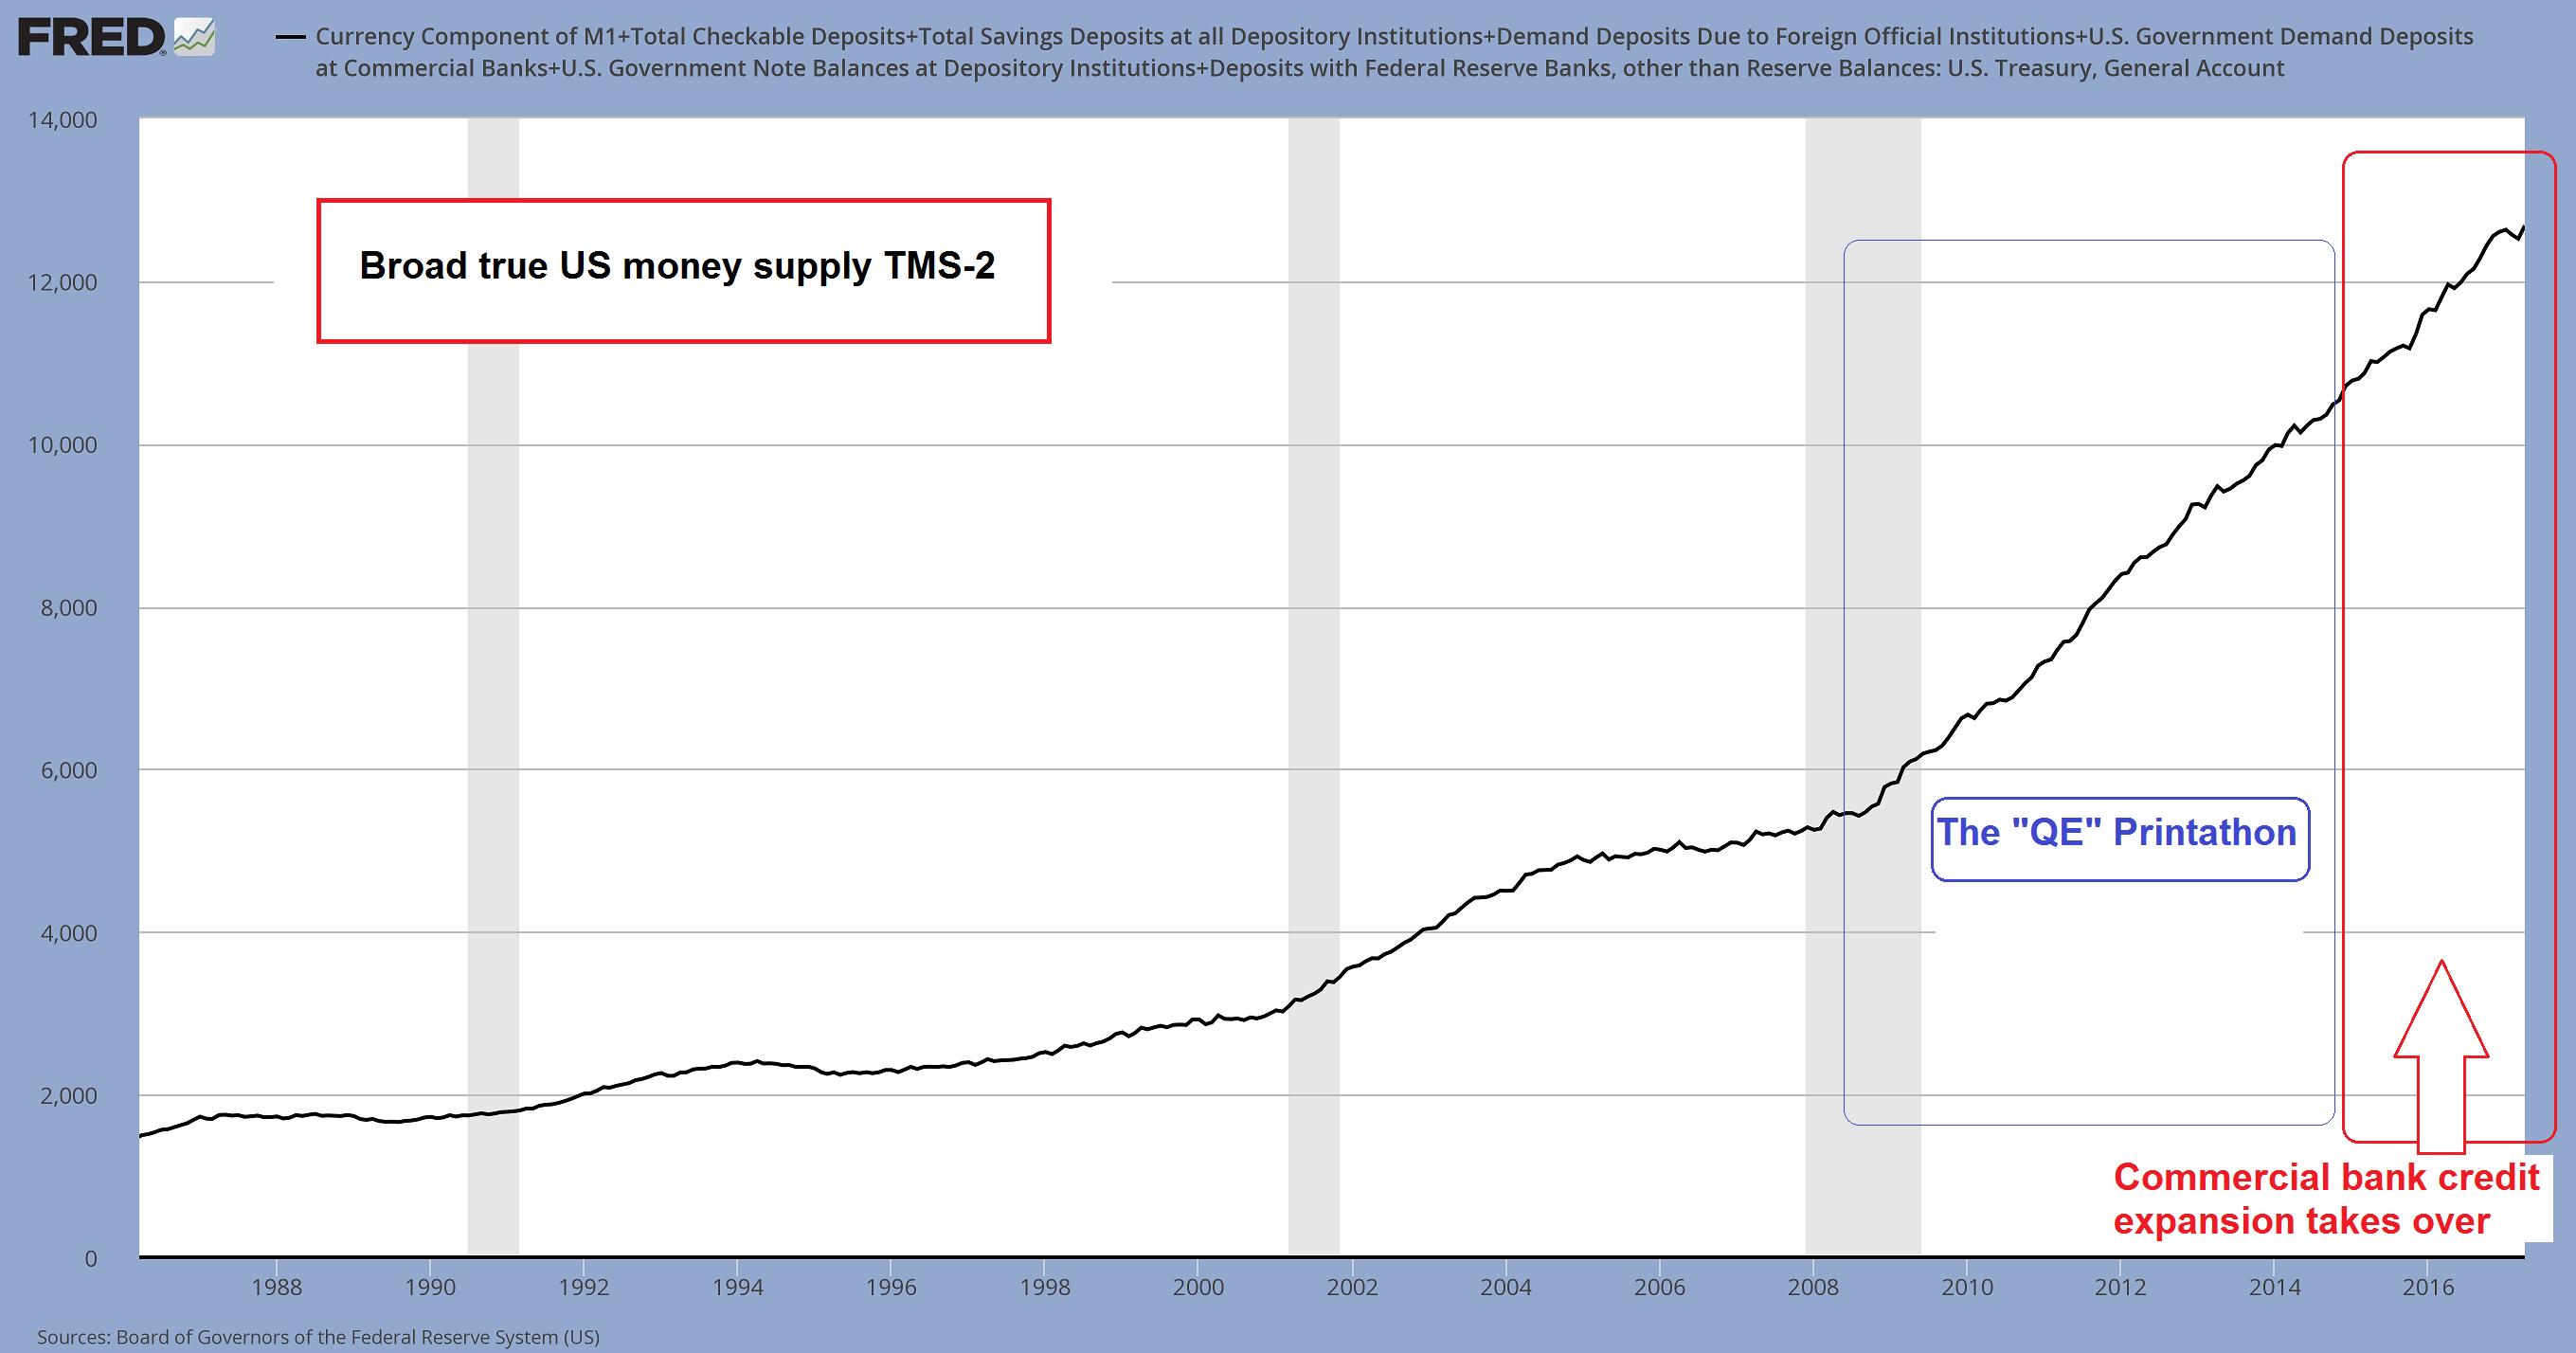 U.S. Broad True Money Supply, 1987 - 2017